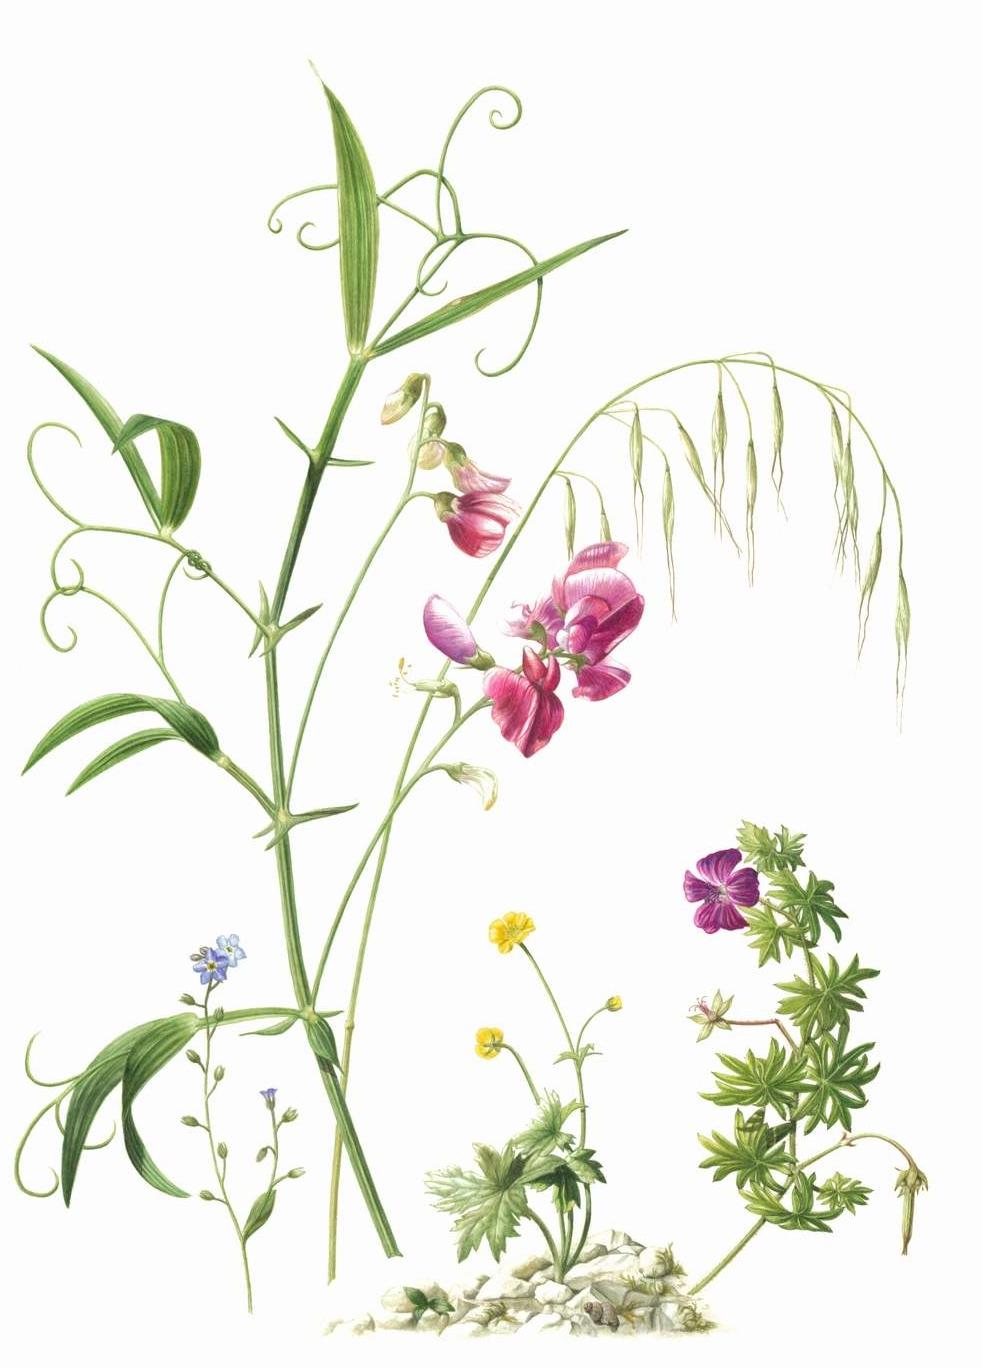 "Summer French Mixed Flowers    Lathyrus linifolins montanus - Bitter Vetch  Bromus tectorum - Cheatgrass  Geranium sanguineum - Blody Cranesbill  Ranunculus acris - Meadow Buttercup  Myosotis arvensis - Field forget-me-not      Watercolour  11"" x 16"""